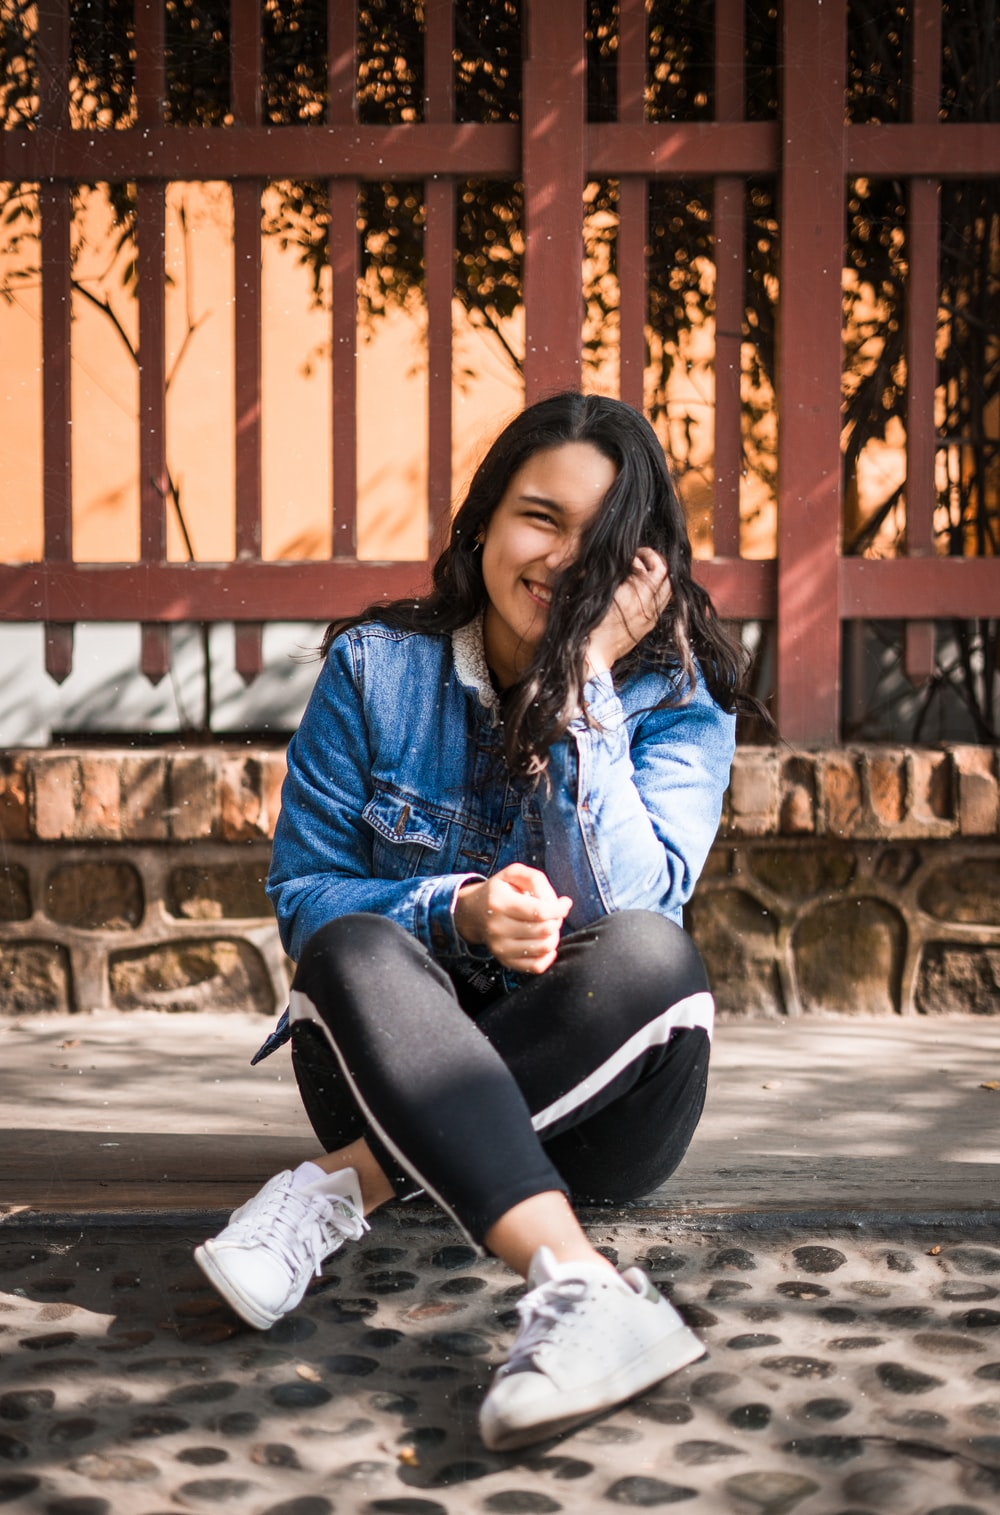 smiling woman wearing blue denim jacket and black leggings